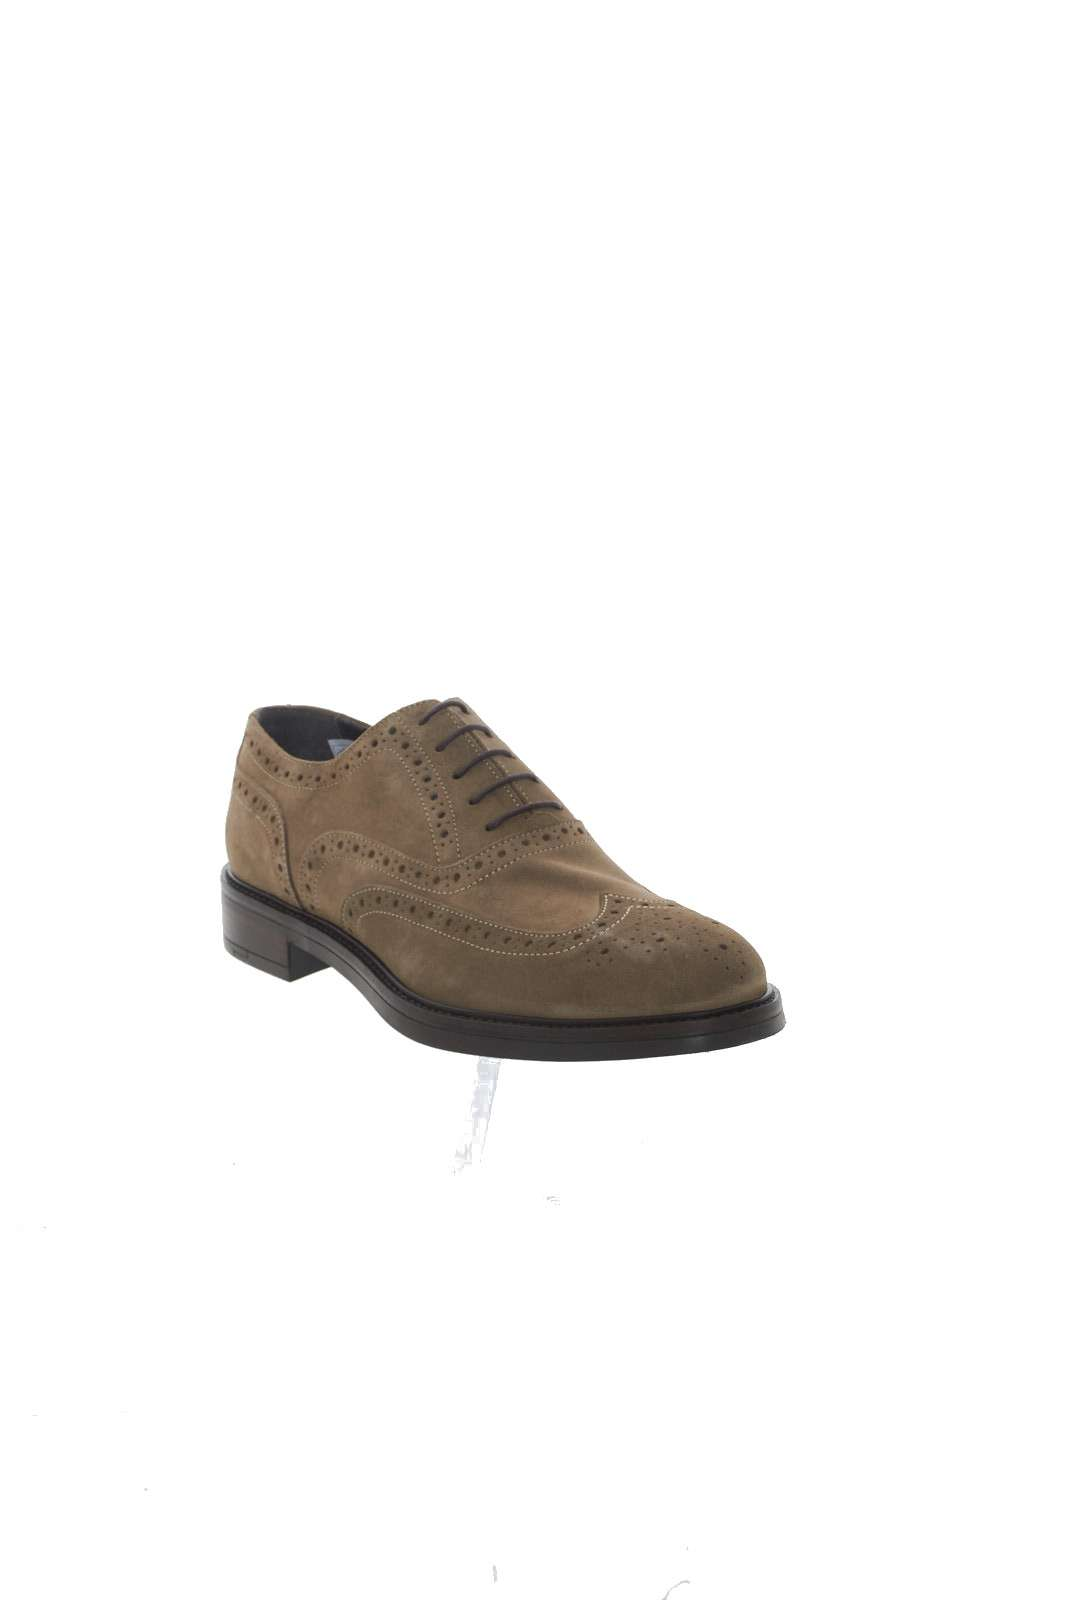 https://www.parmax.com/media/catalog/product/a/i/AI-outlet_parmax-scarpe-uomo-Libero%20Fashion-7582-B.jpg